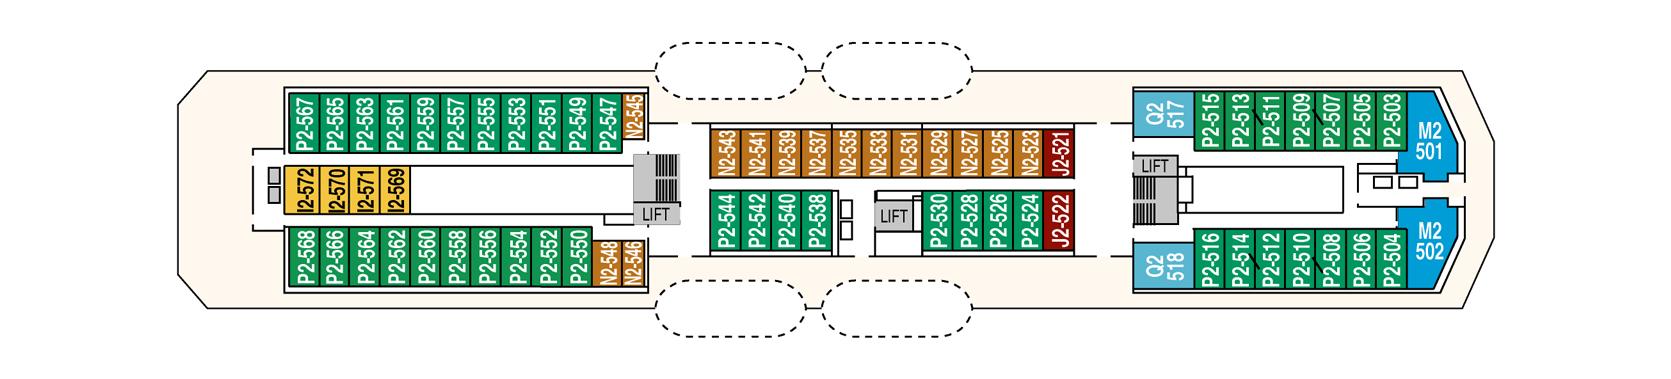 Deck 5.png